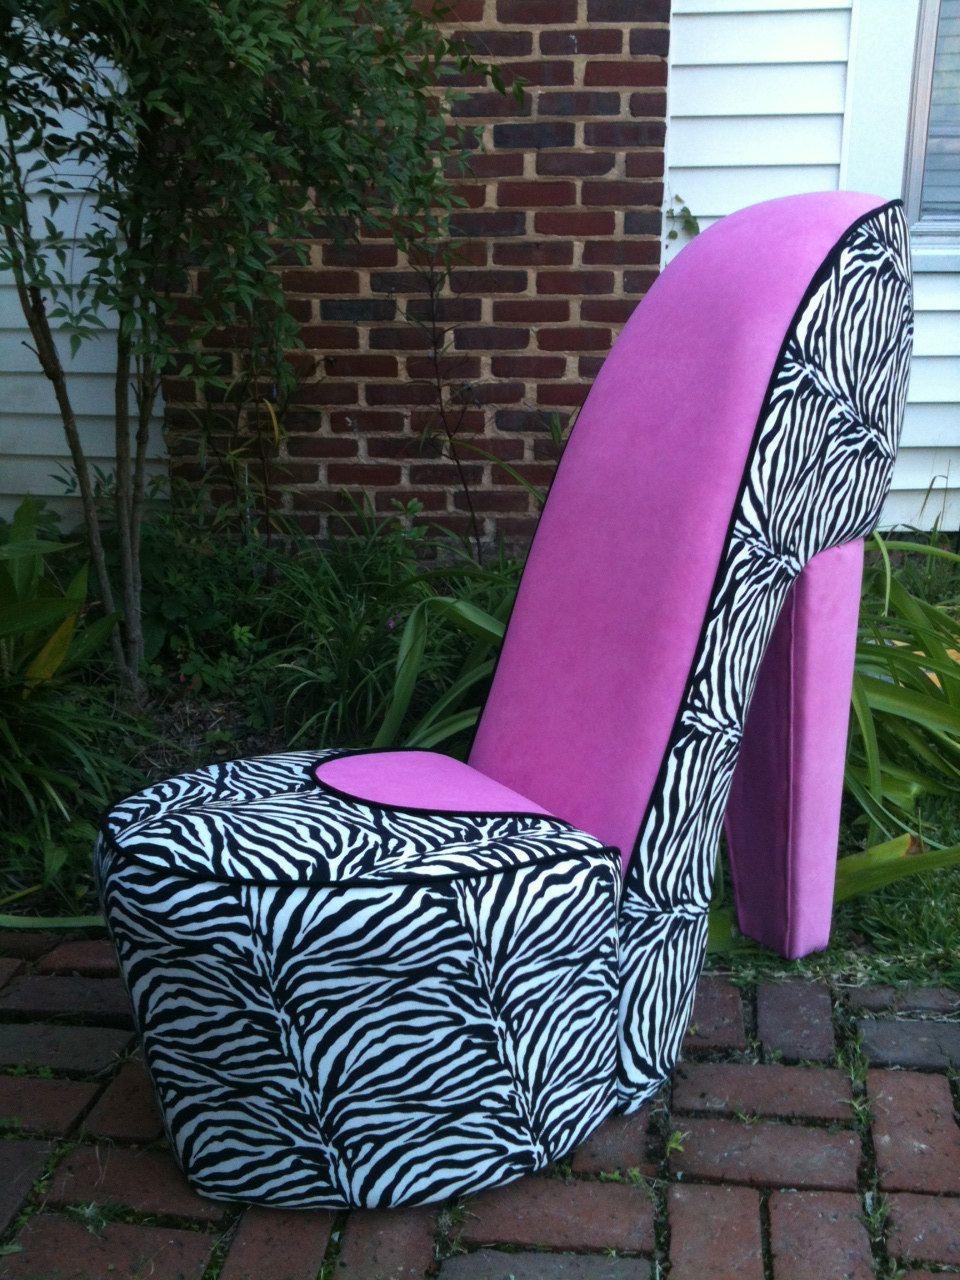 Giant bean bag chair lounger breakyourpiggybank - Handmade Zebra Pink High Heel Shoe Chair By Merimeg On Etsy 179 00